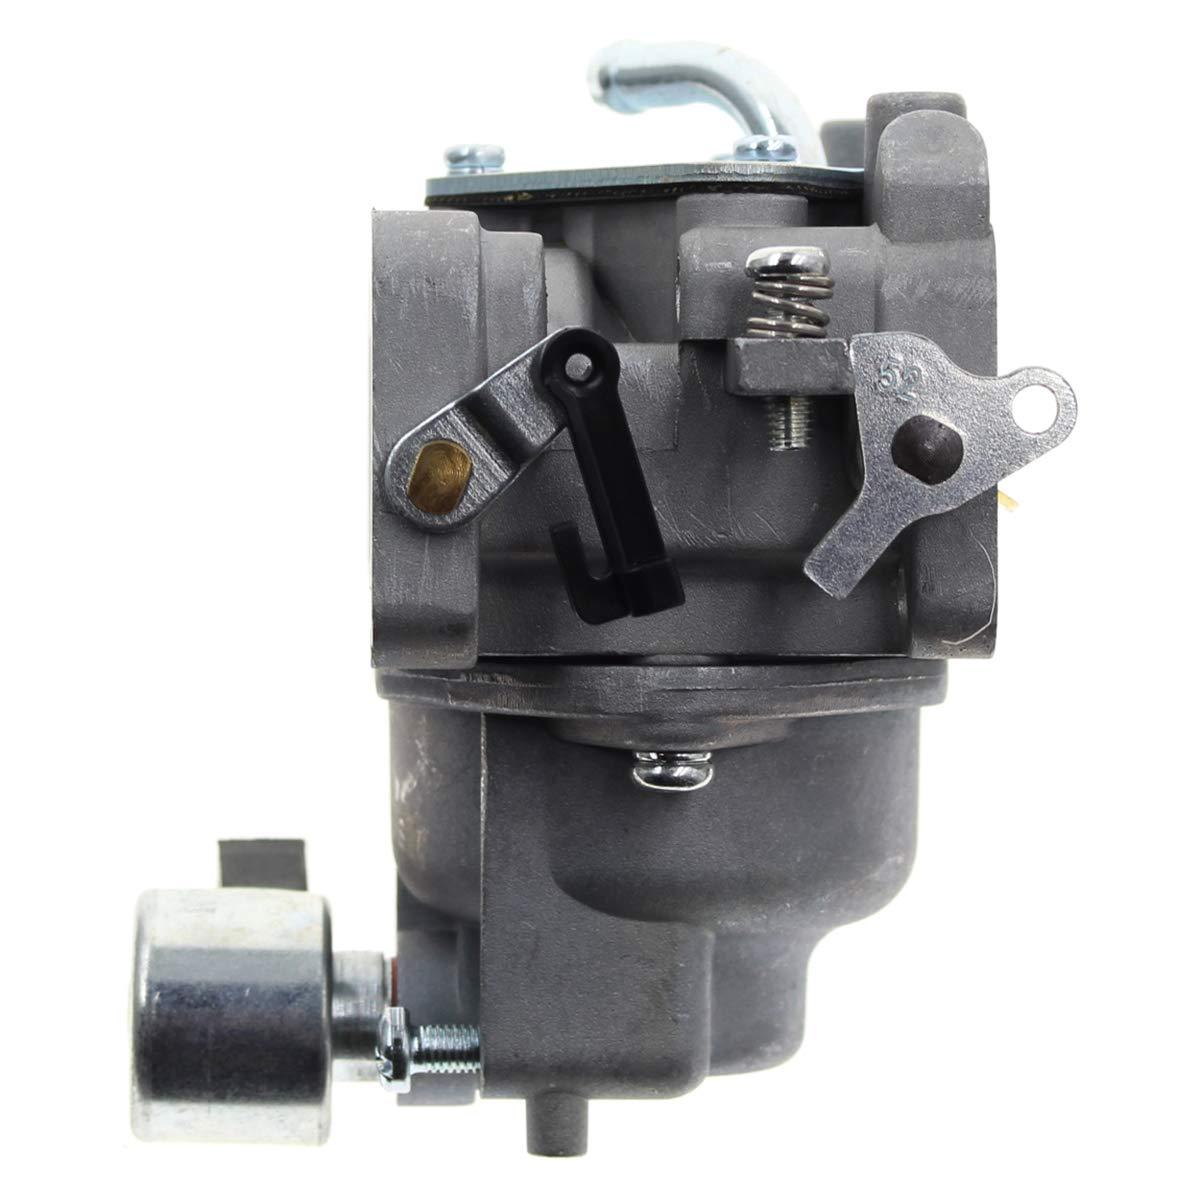 FH661V Replaces 15004-0763 15004-7024 Carbhub Carburetor for Kawasaki some FH641V 15004-1010